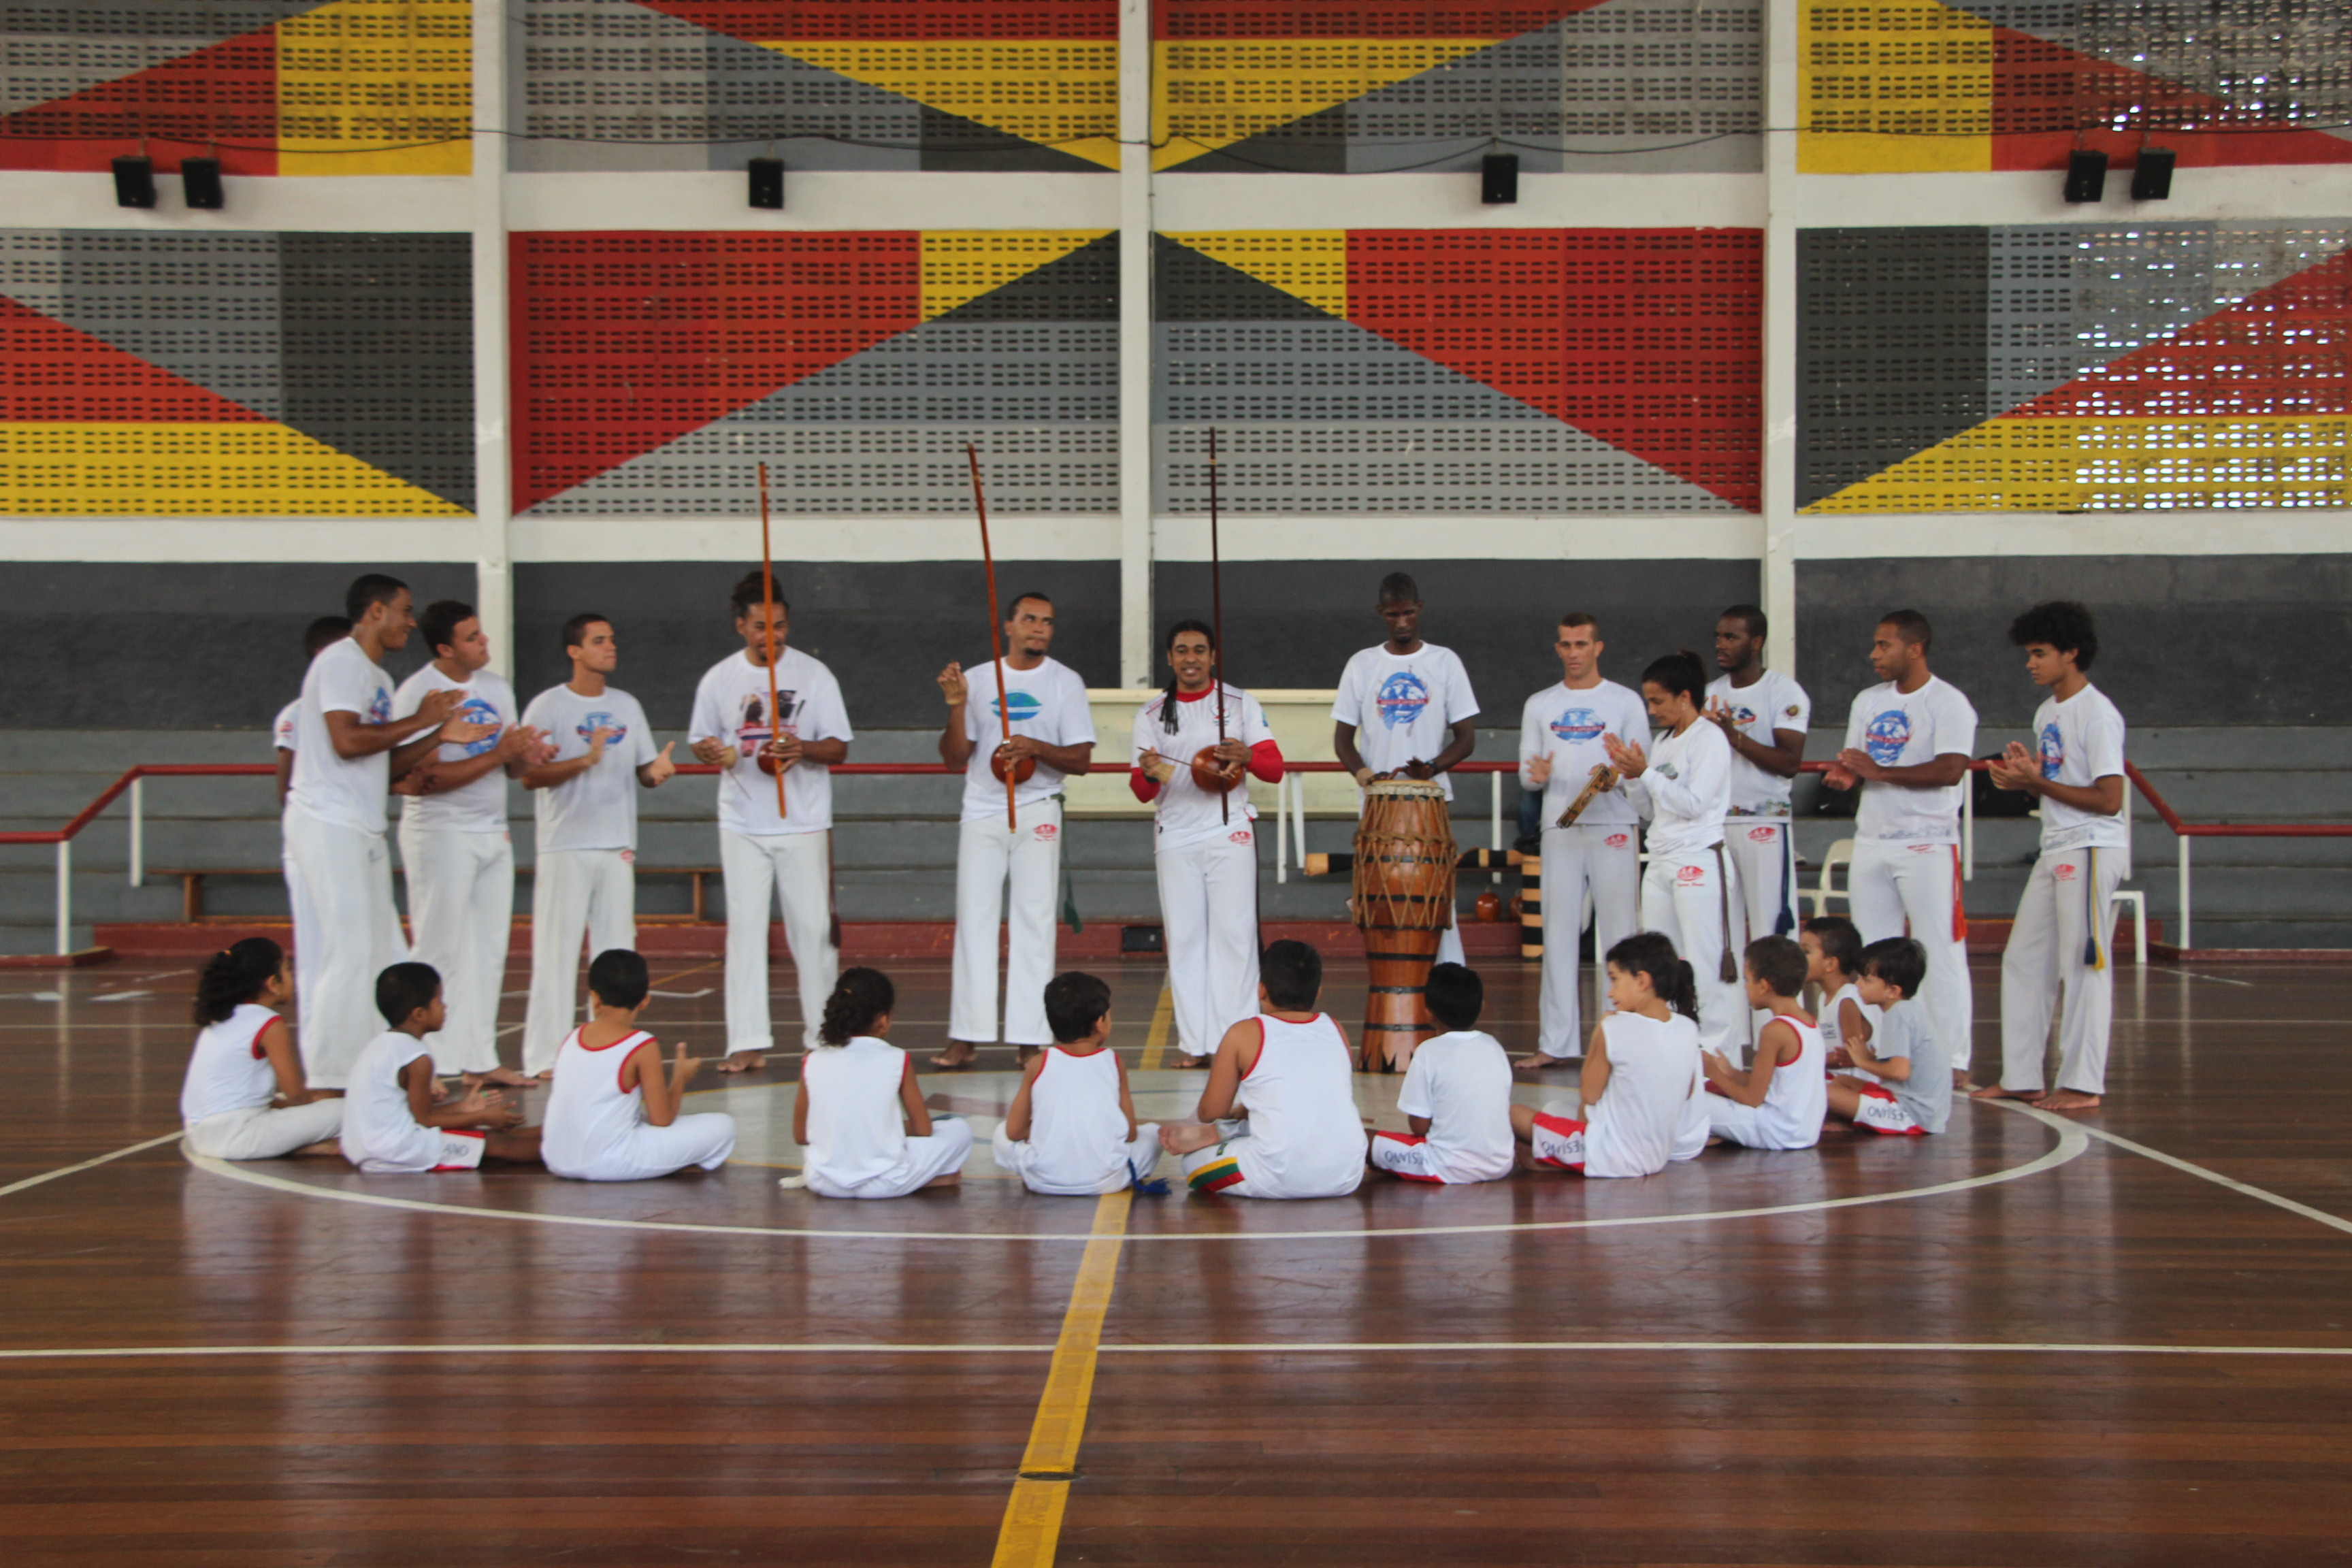 Aul_o_de_capoeira